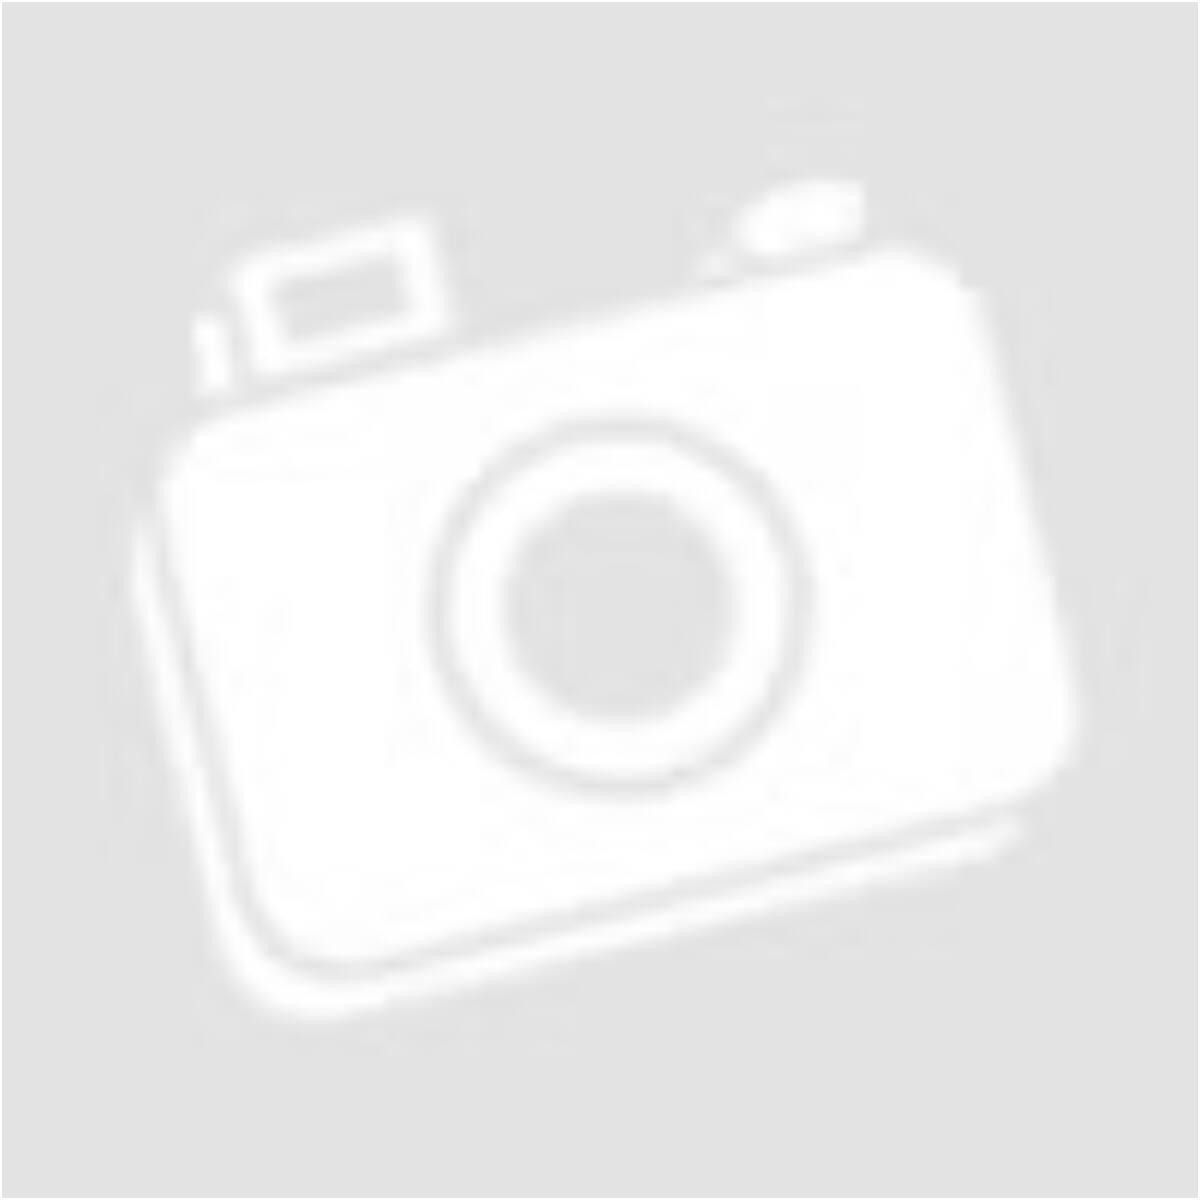 Japan Style kapucnis pulcsi  B46S - fekete-piros - Kapucnis pulóverek 2a755eed98